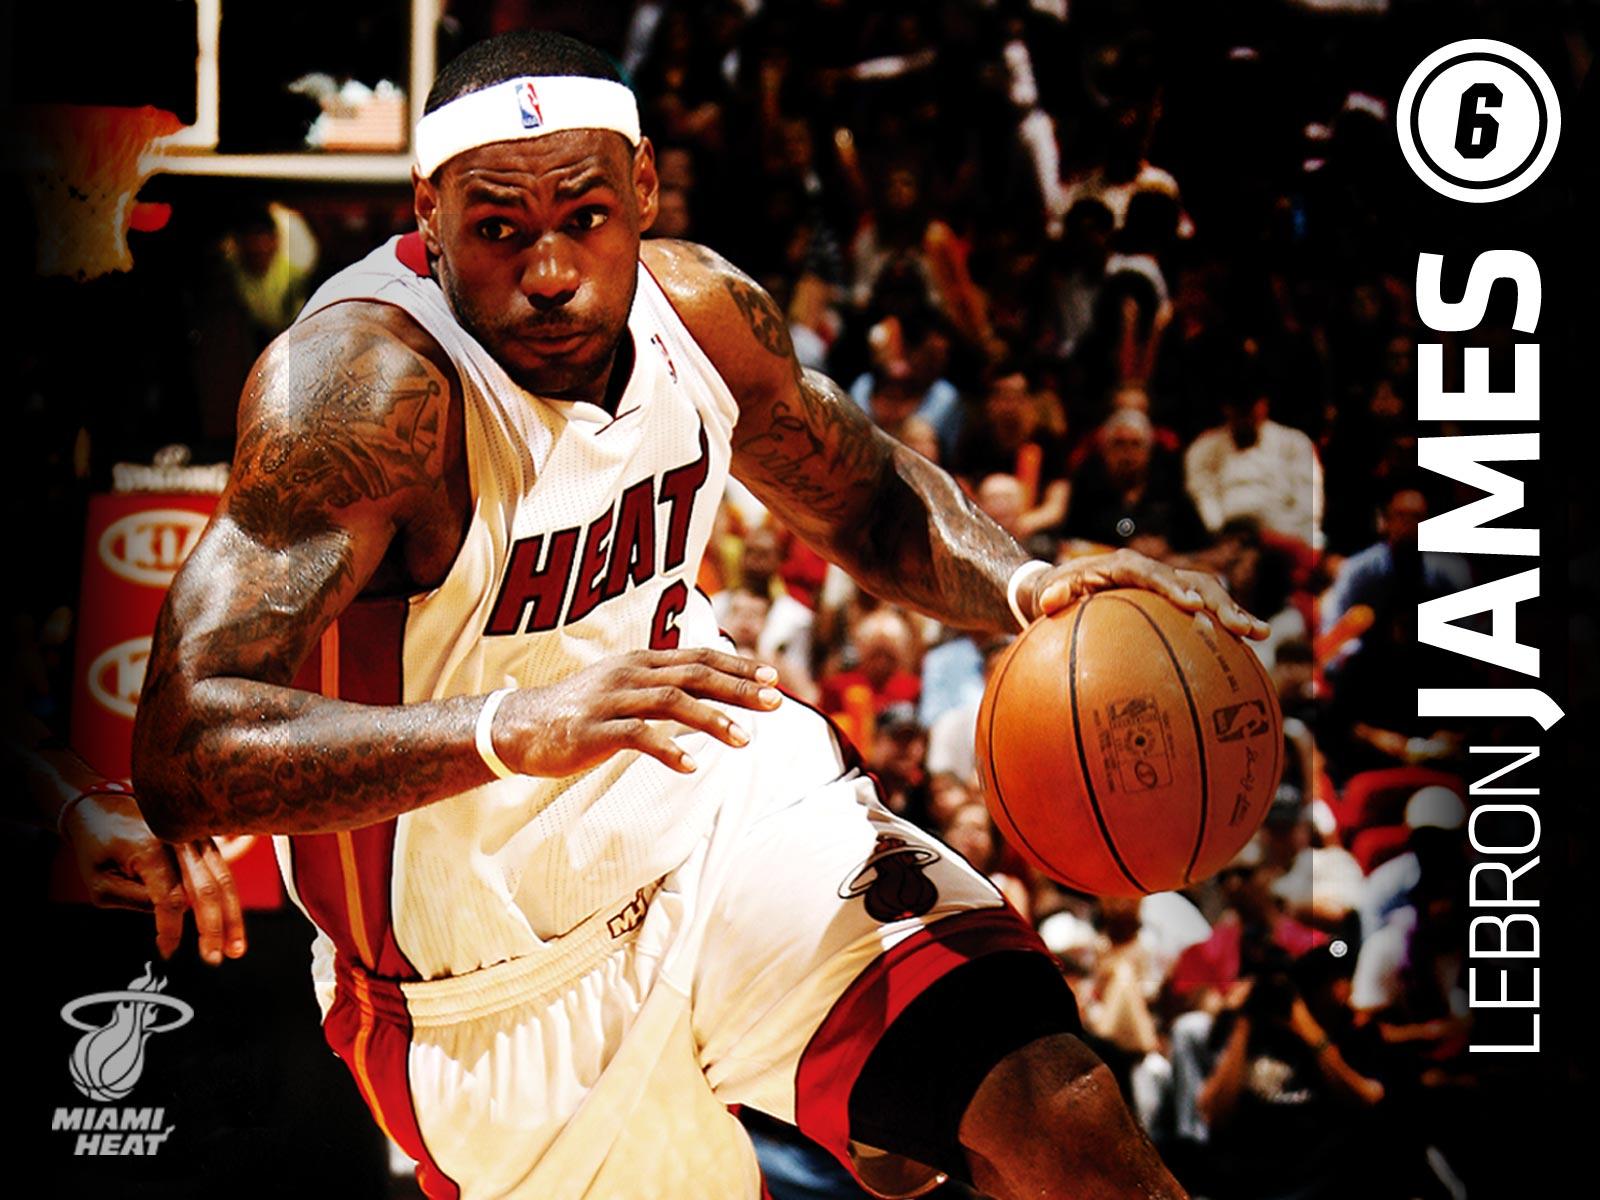 Watch Orlando Magic vs Miami Heat Live streaming OnlineNBA 1600x1200